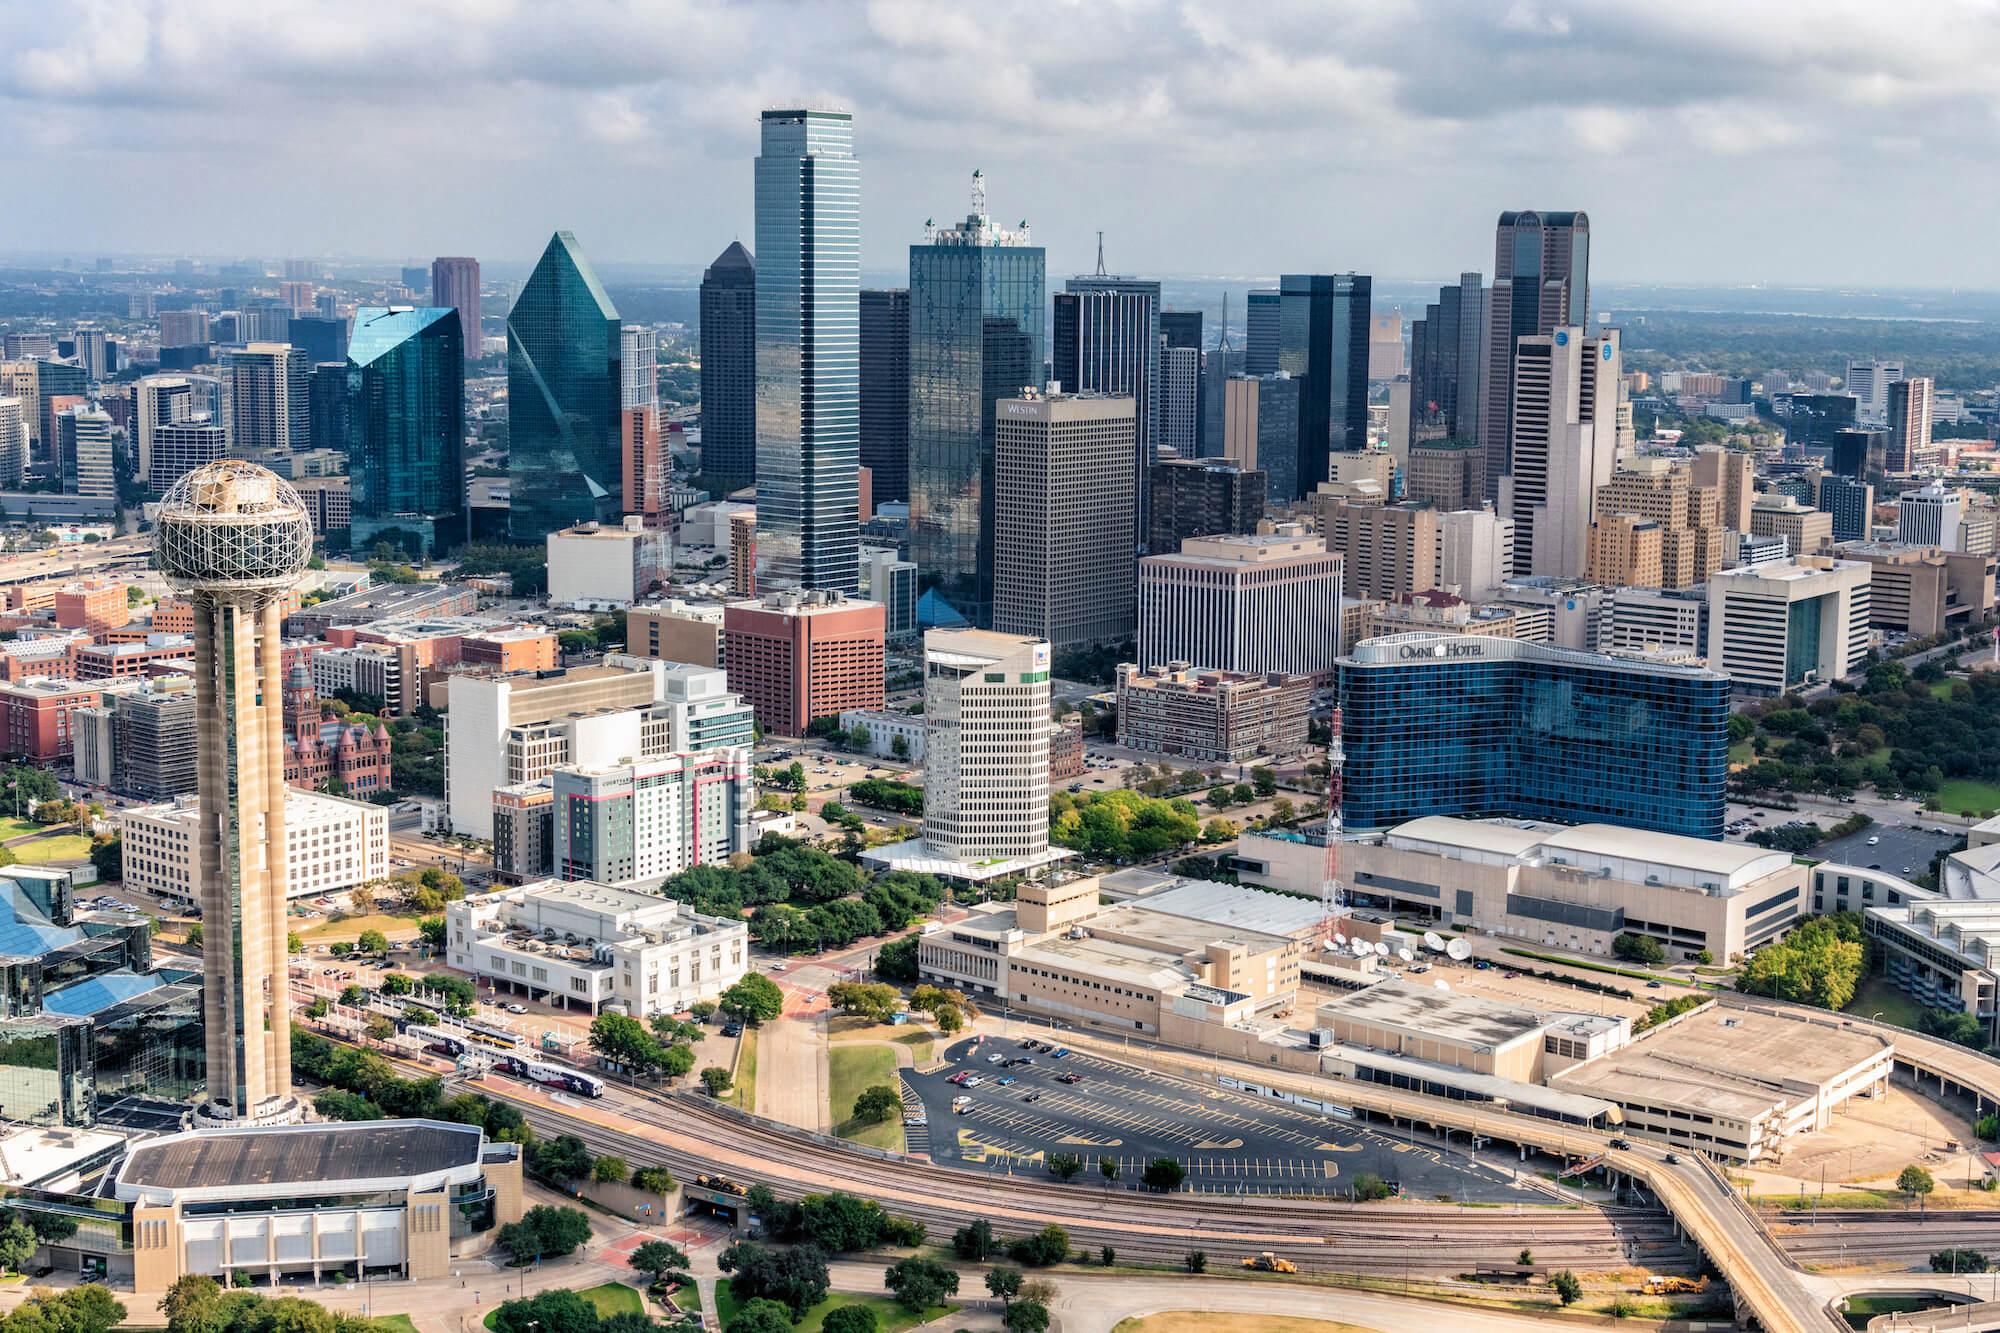 HappyNest Momentum Continues in Texas, Adding Dallas, McKinney